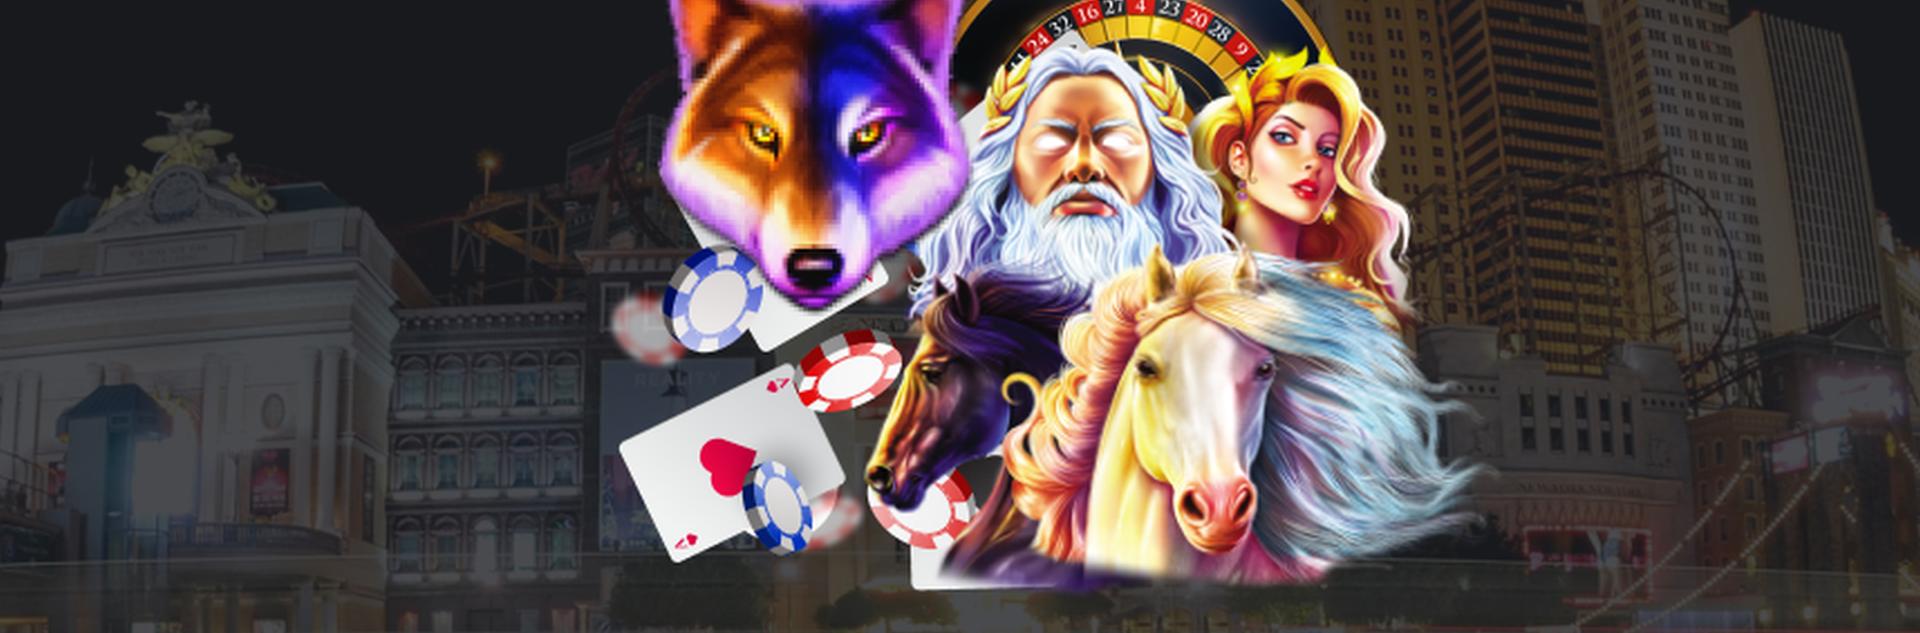 Unikrn casino review NZ